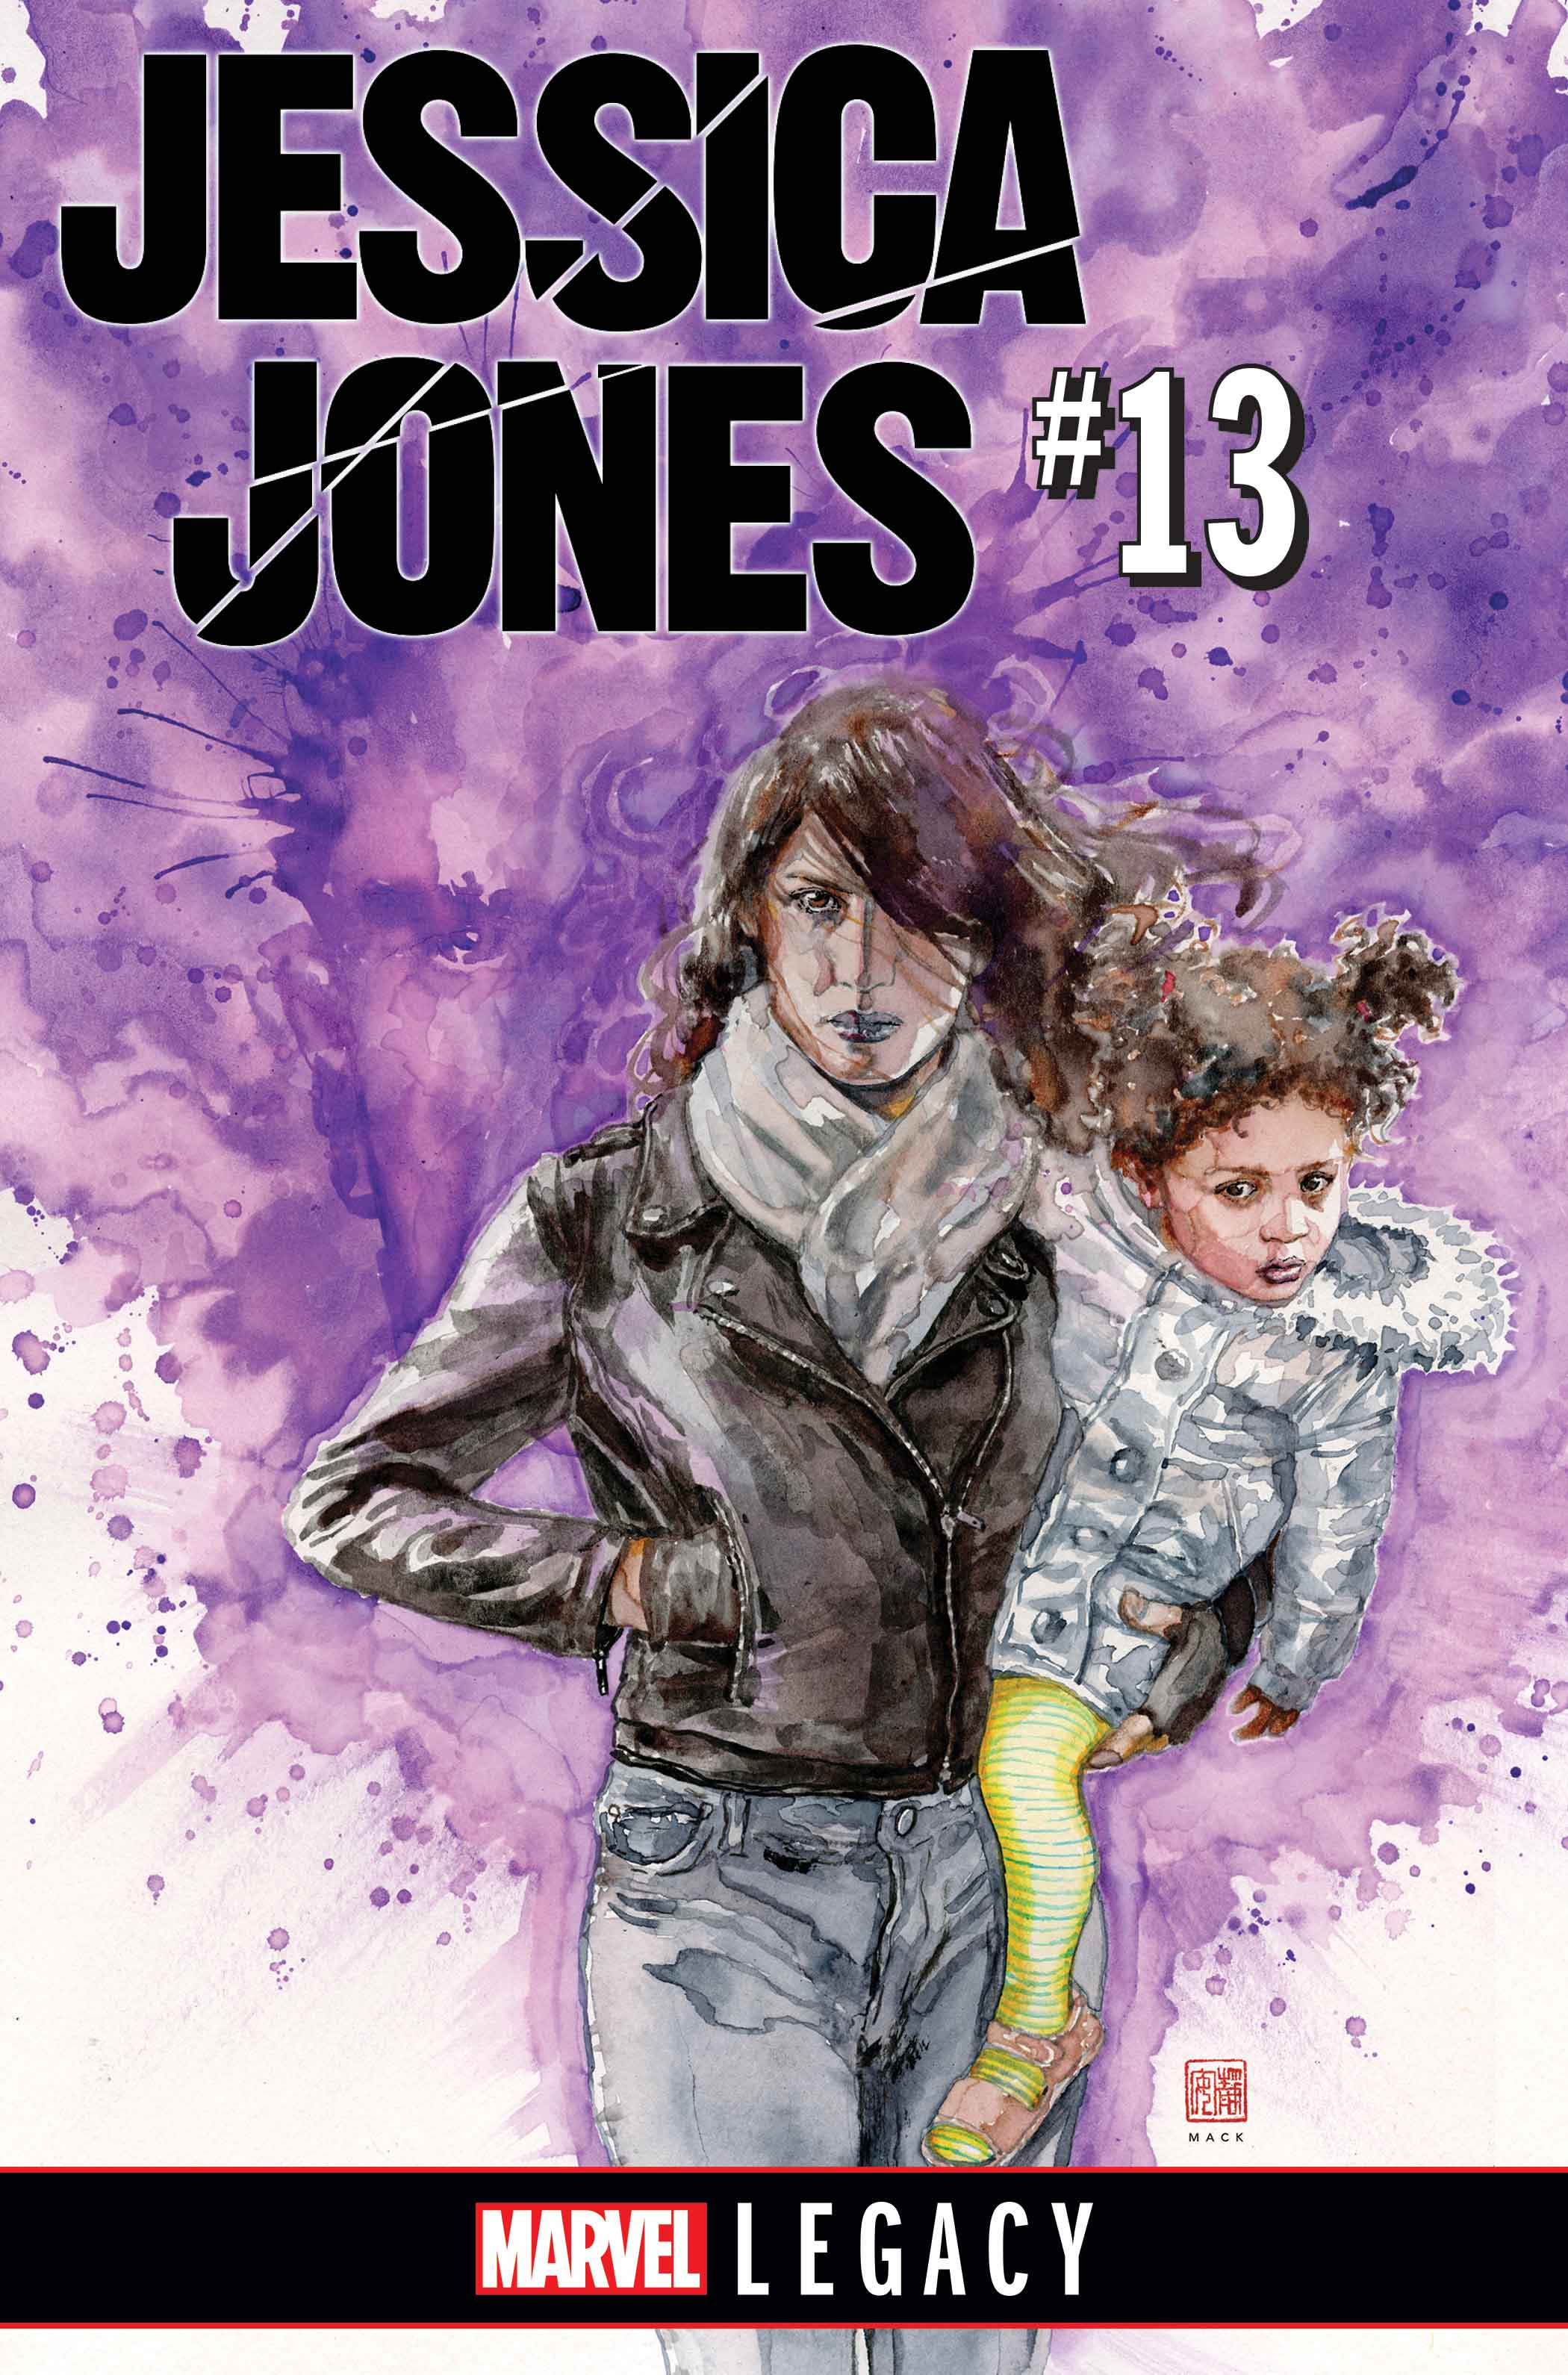 Jessica Jones #13 Legacy: Return of the Purple Man ile ilgili görsel sonucu